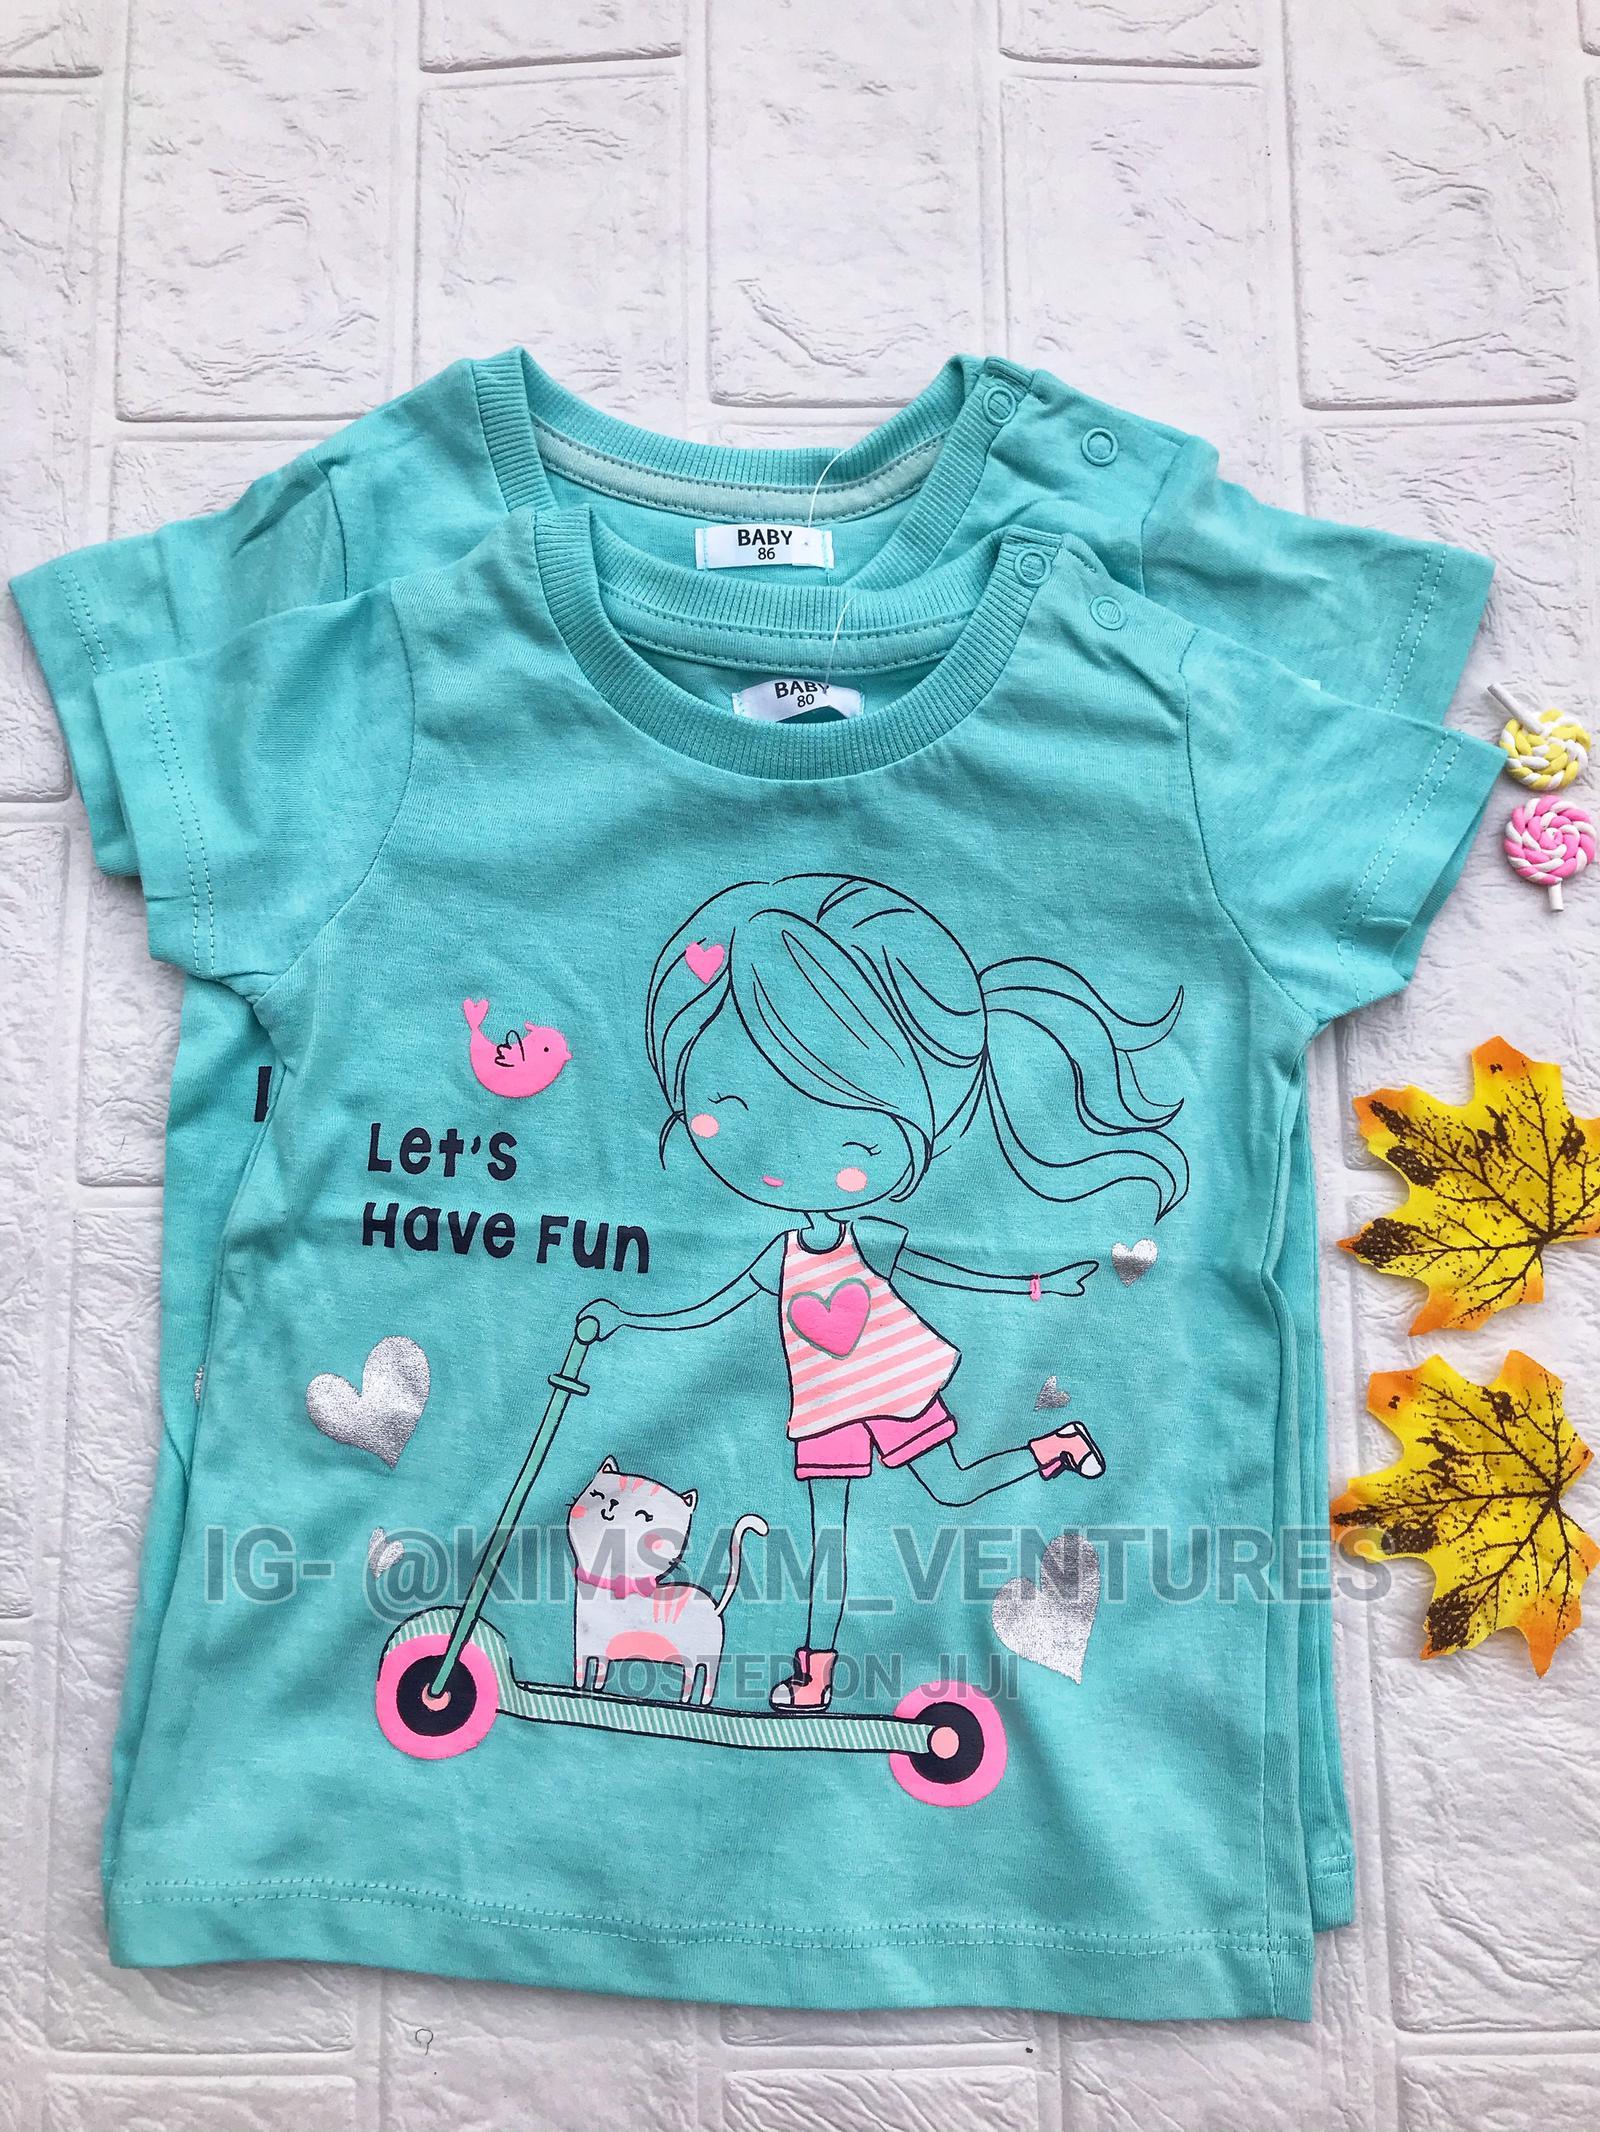 Kiddies Clothes on Sales